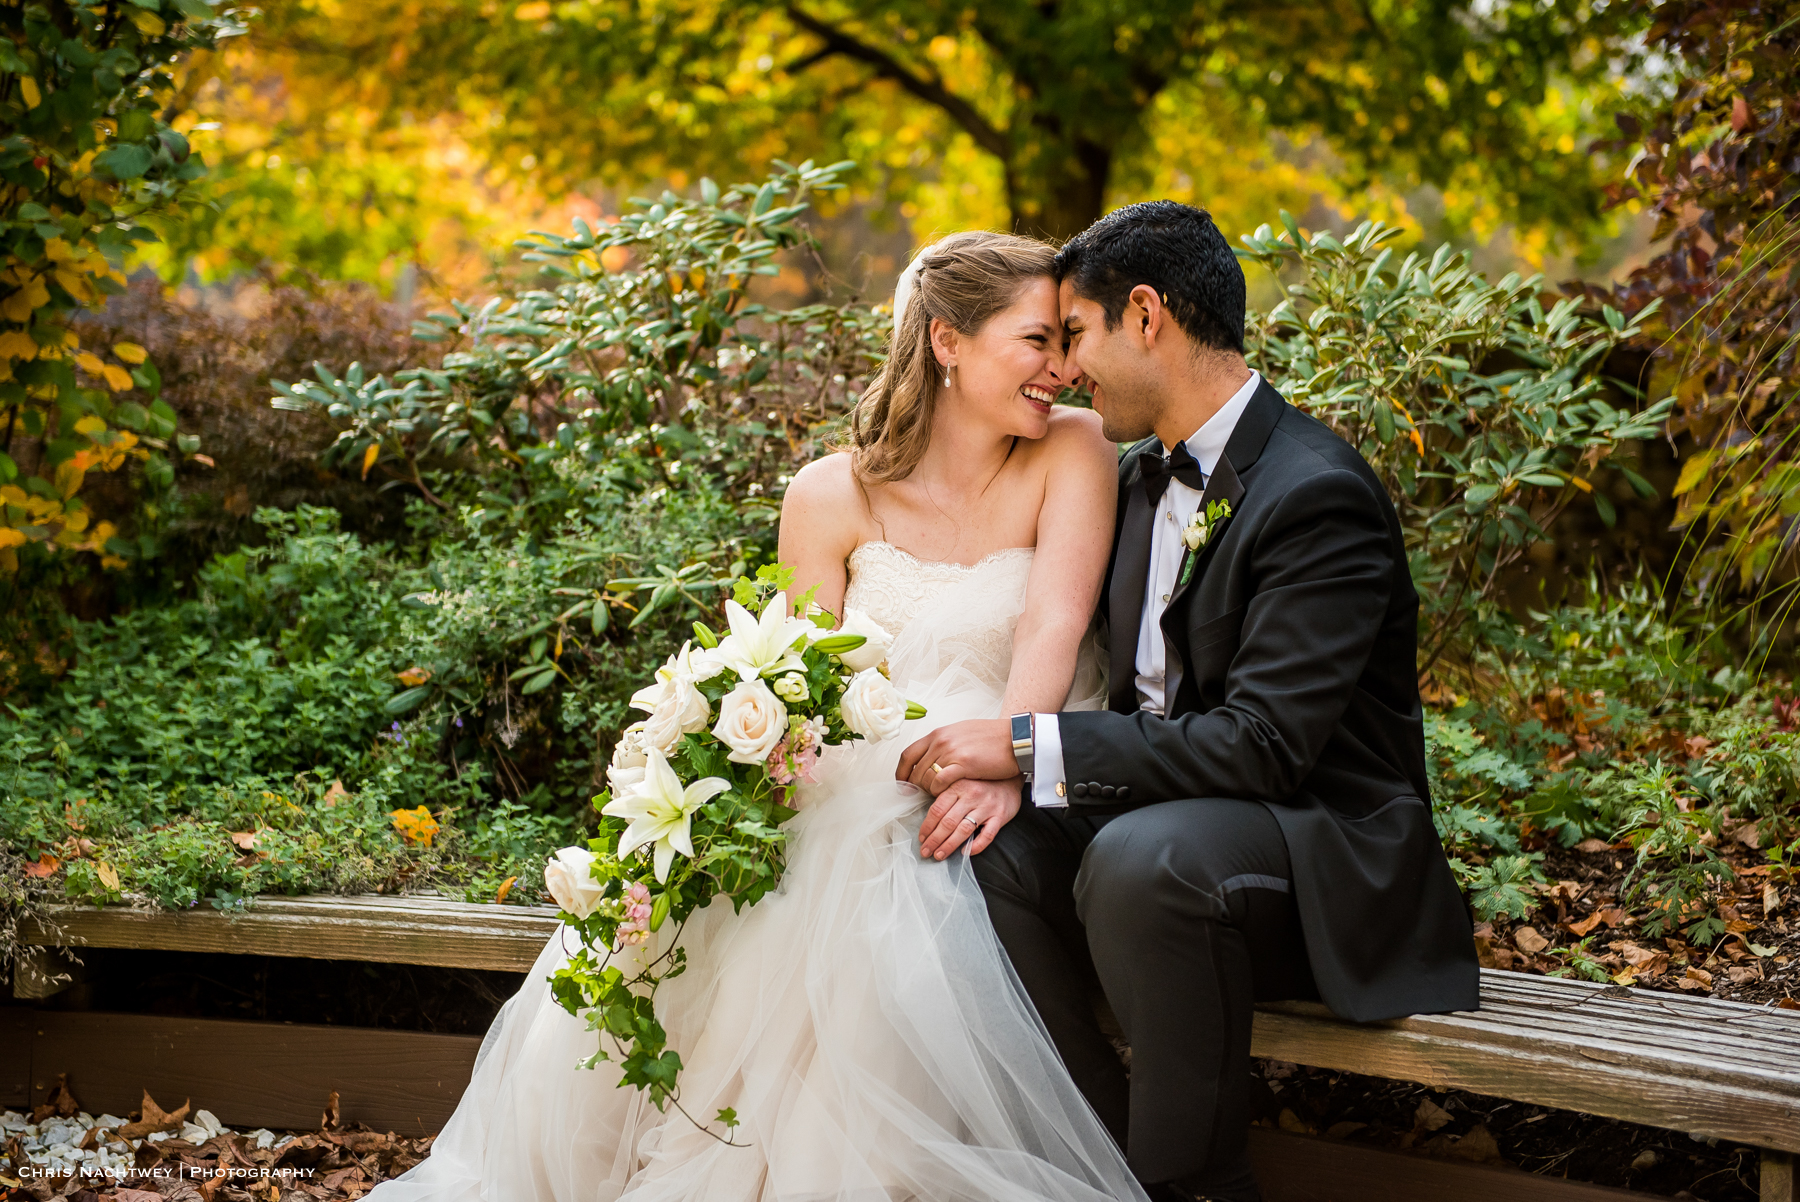 wedding-the-litchfield-inn-ct-photos-chris-nachtwey-photography-2018-37.jpg